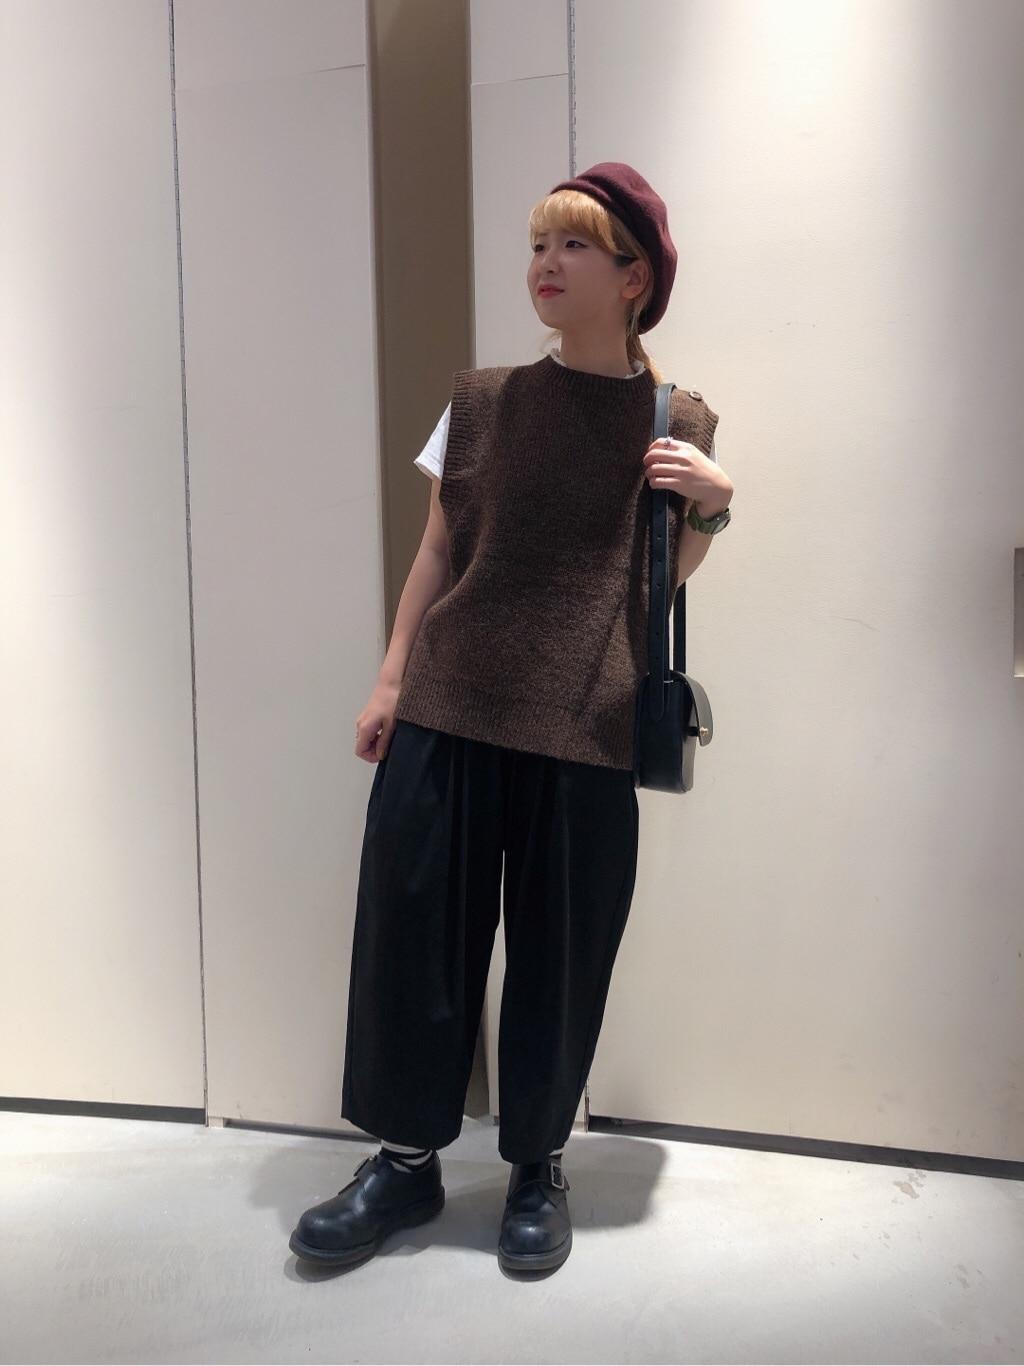 bulle de savon 阪急西宮ガーデンズ 身長:152cm 2019.09.04